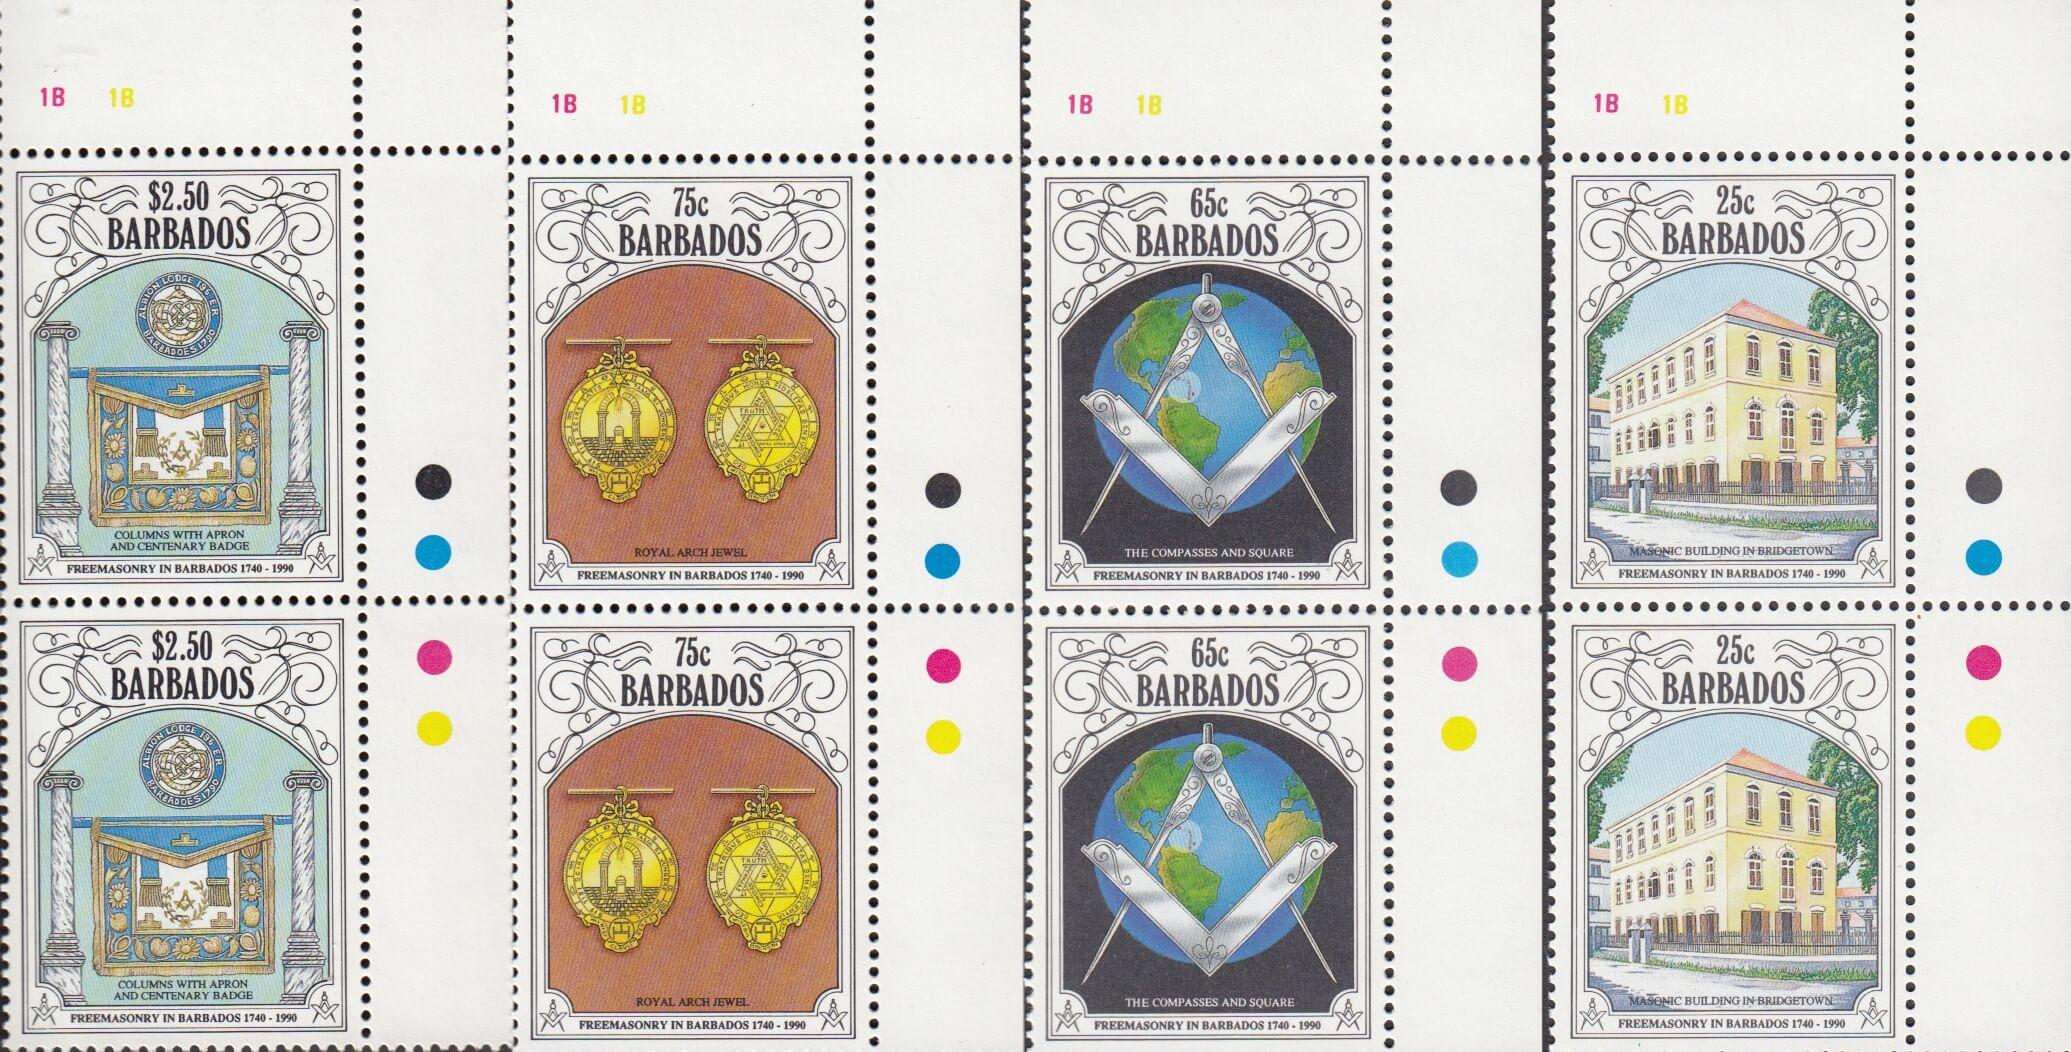 Barbados SG 956-959 | 250th Anniversary of Freemasonry in Barbados